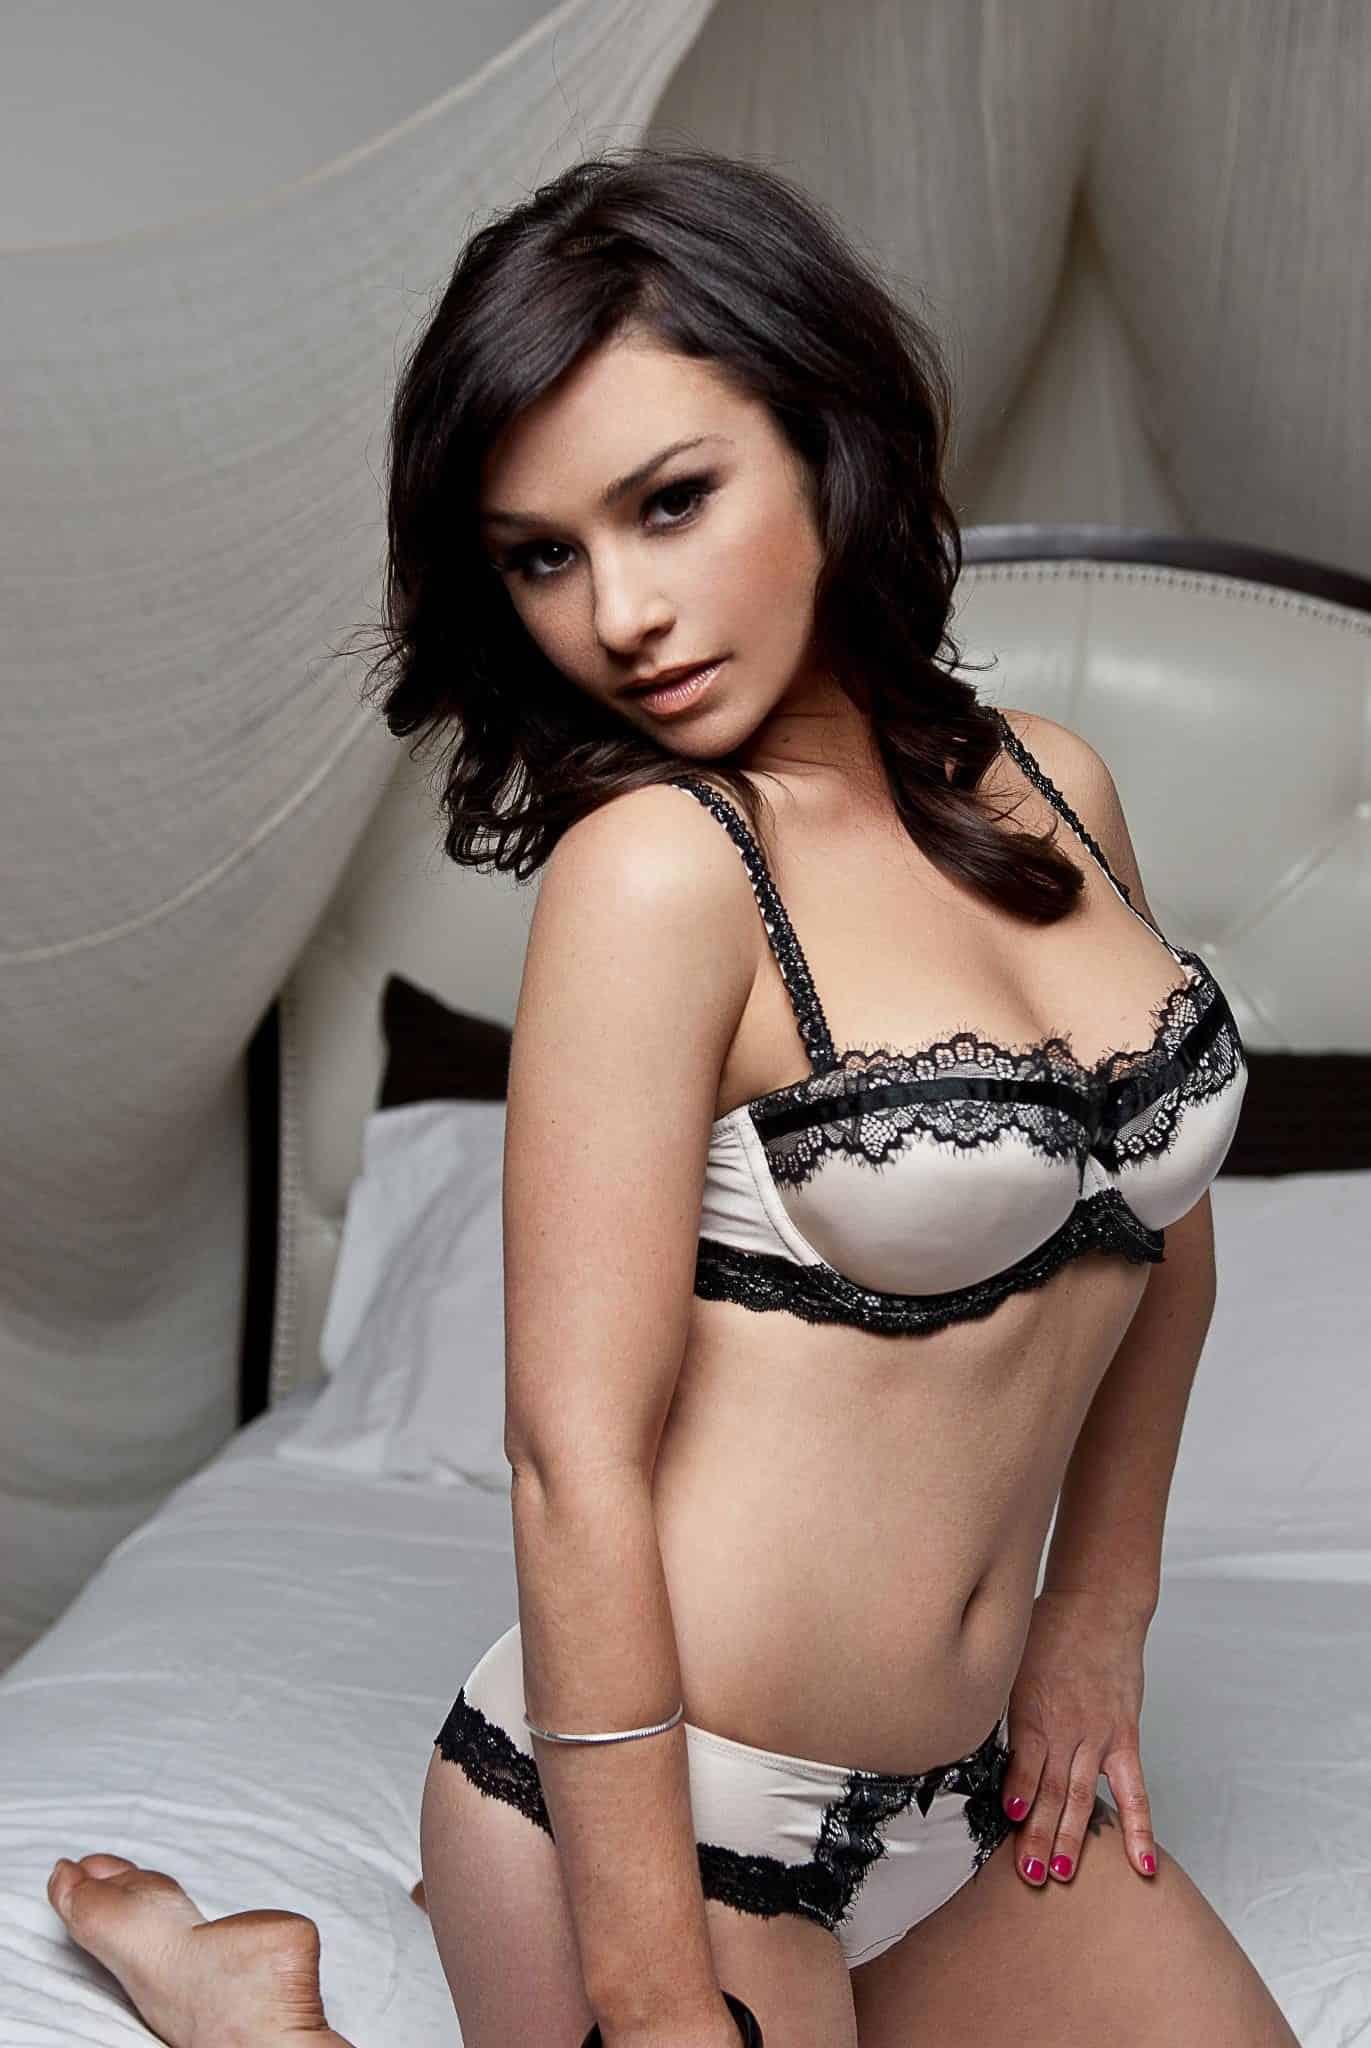 danielle-harris-height-weight-age-bra-size-body-stats-affairs-boy-friends-3